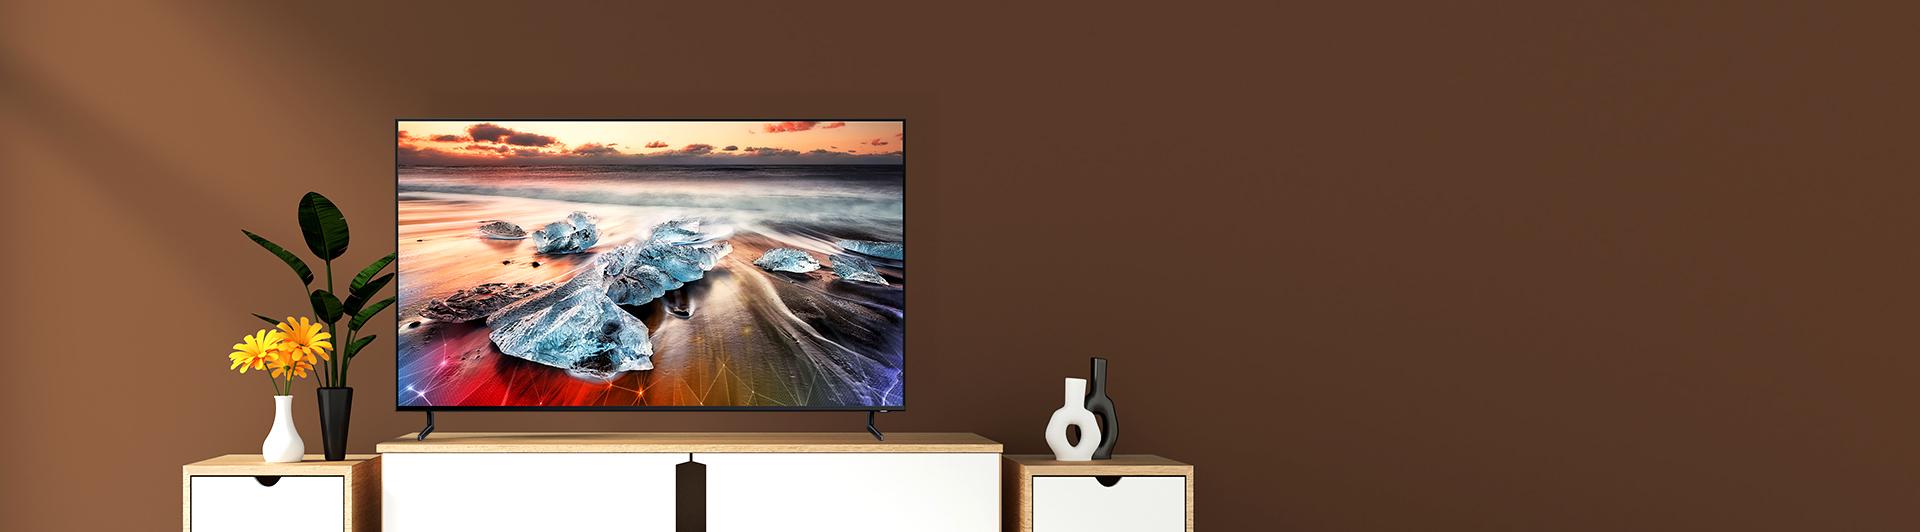 Tivi QLED Samsung 65 inch QA65Q900RBKXXV